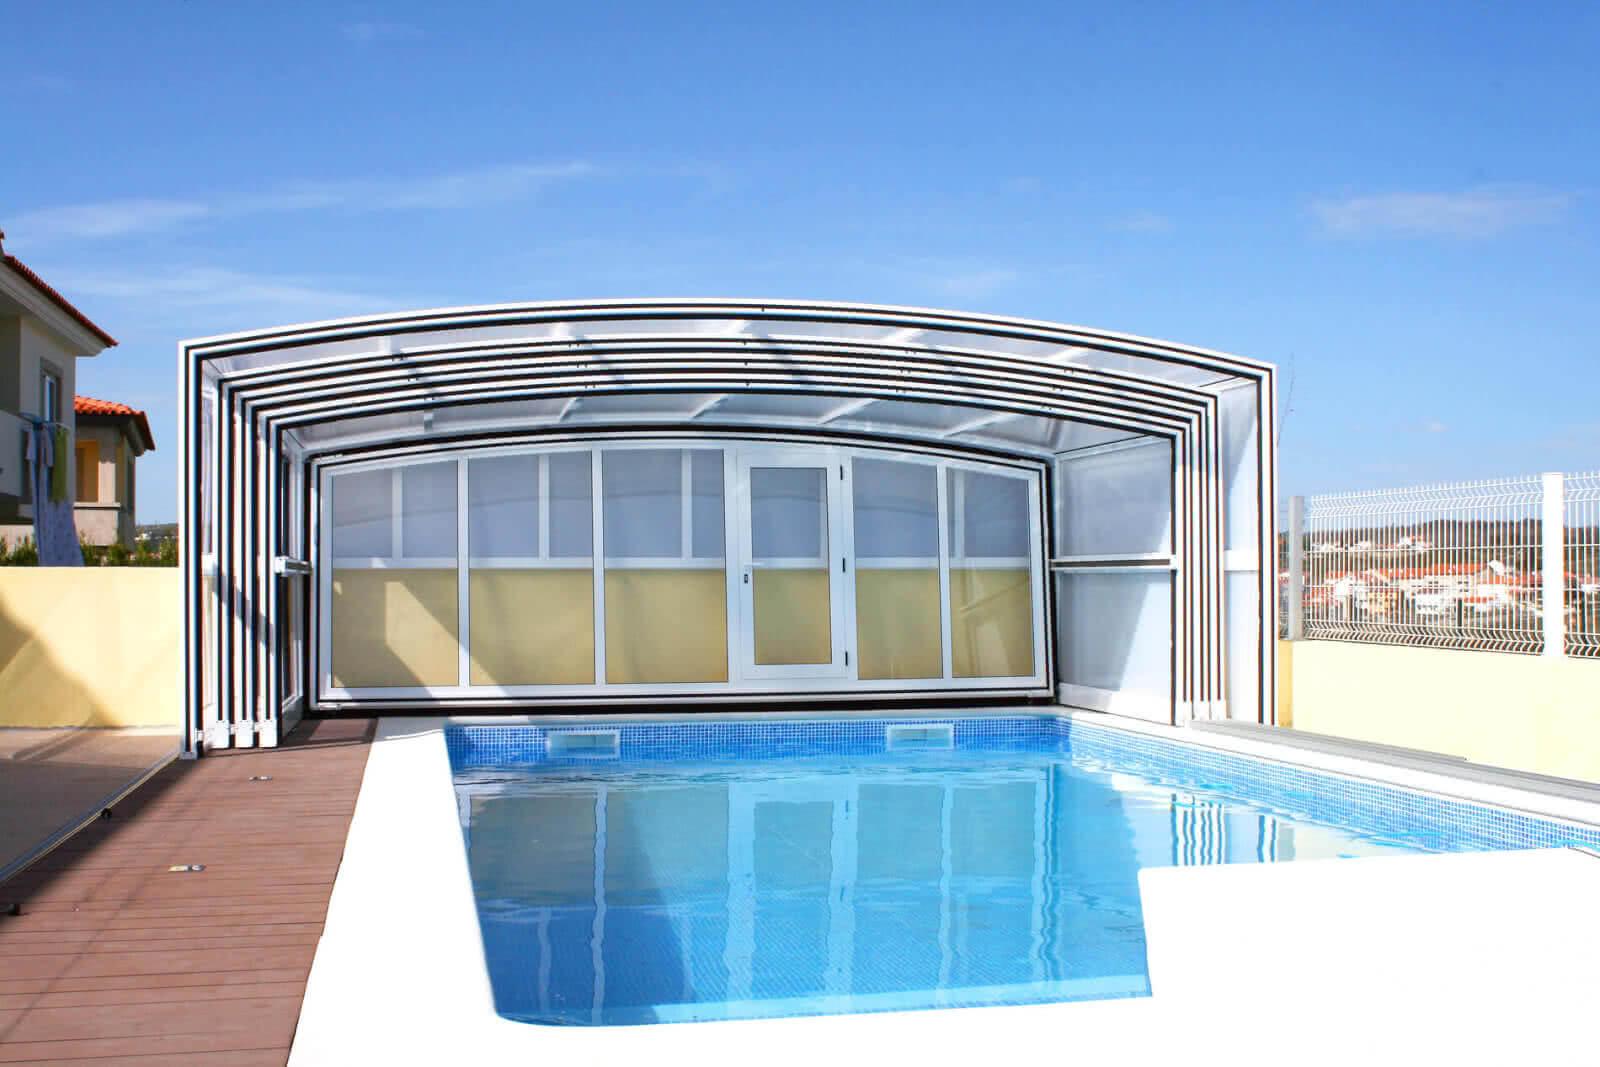 Fabricantes de cubiertas de piscinas en andaluc a - Piscinas cubiertas sevilla ...